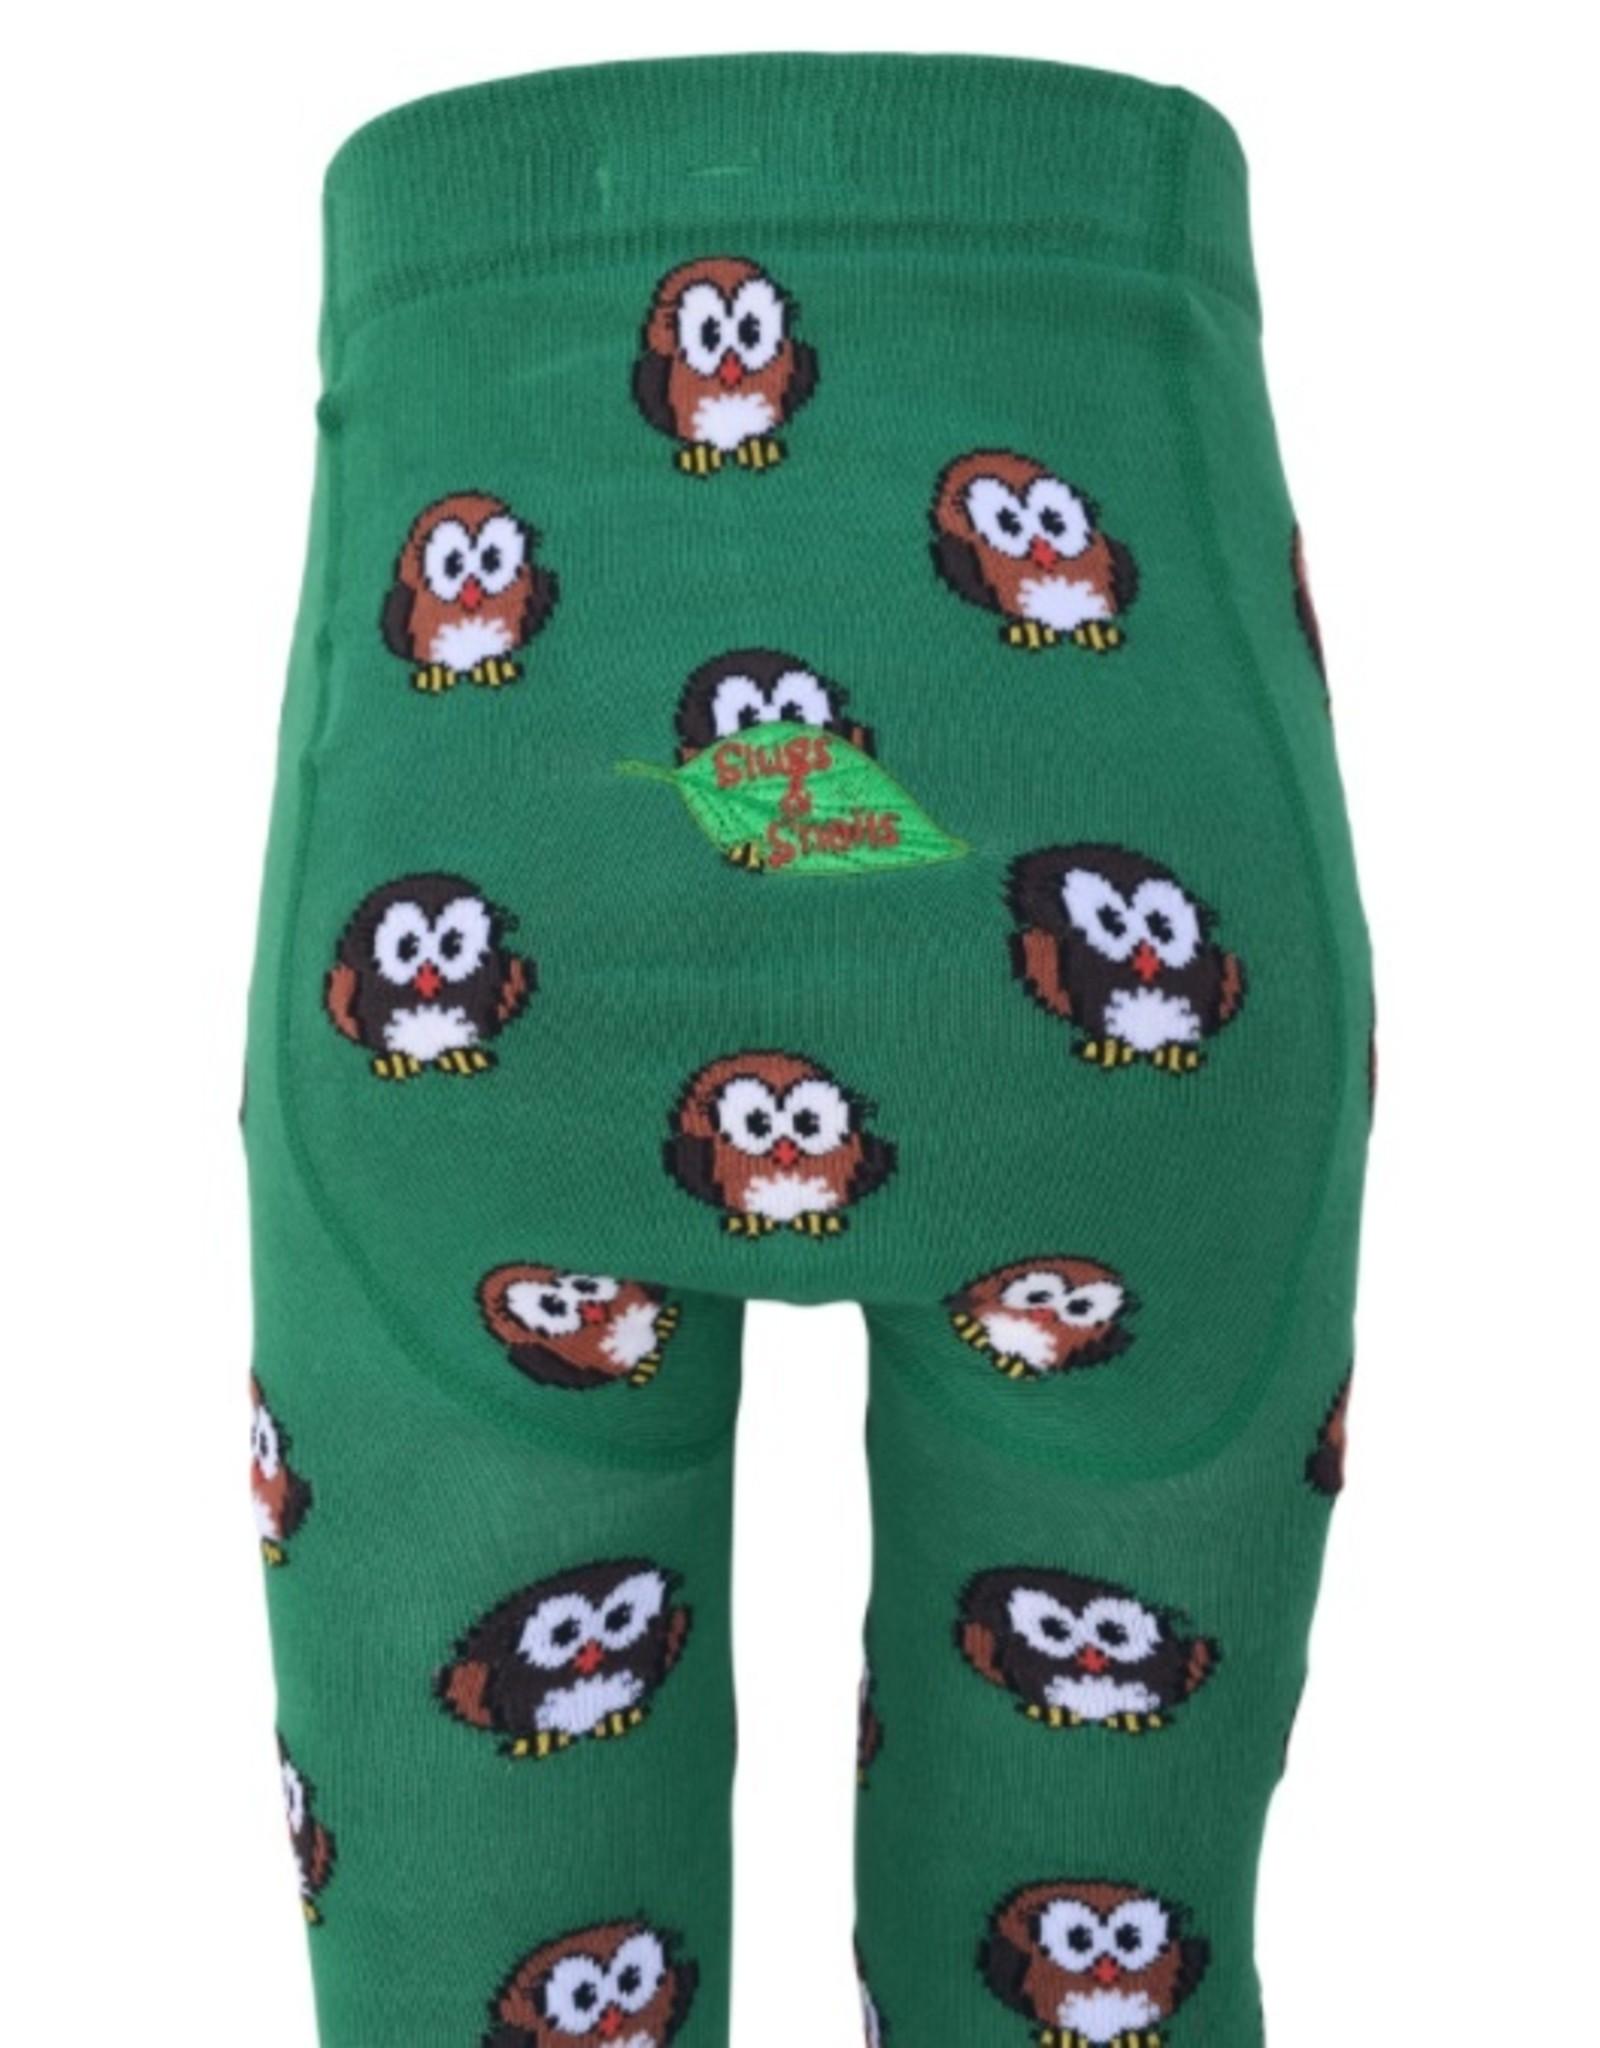 Slugs & Snails Kinder maillots - uilen